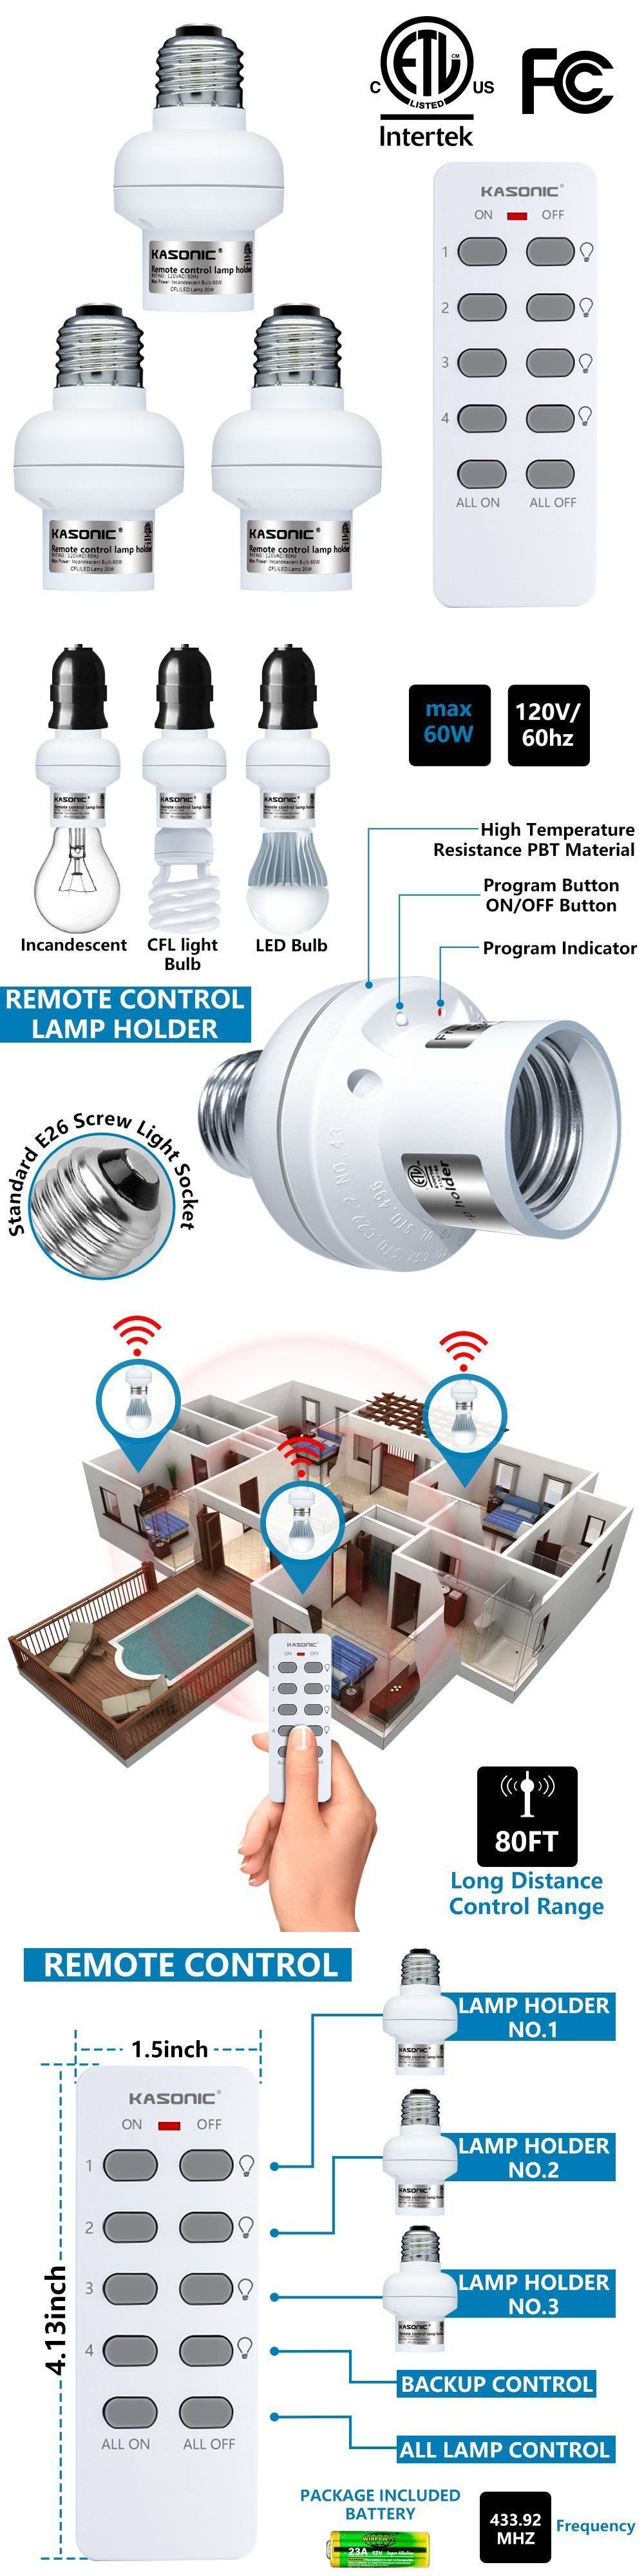 Wireless Remote Control Lamp Holder Smart Home Lamp For E26 E27 Bulb Baseholder Lamp Holder Remote Control Wireless Lights